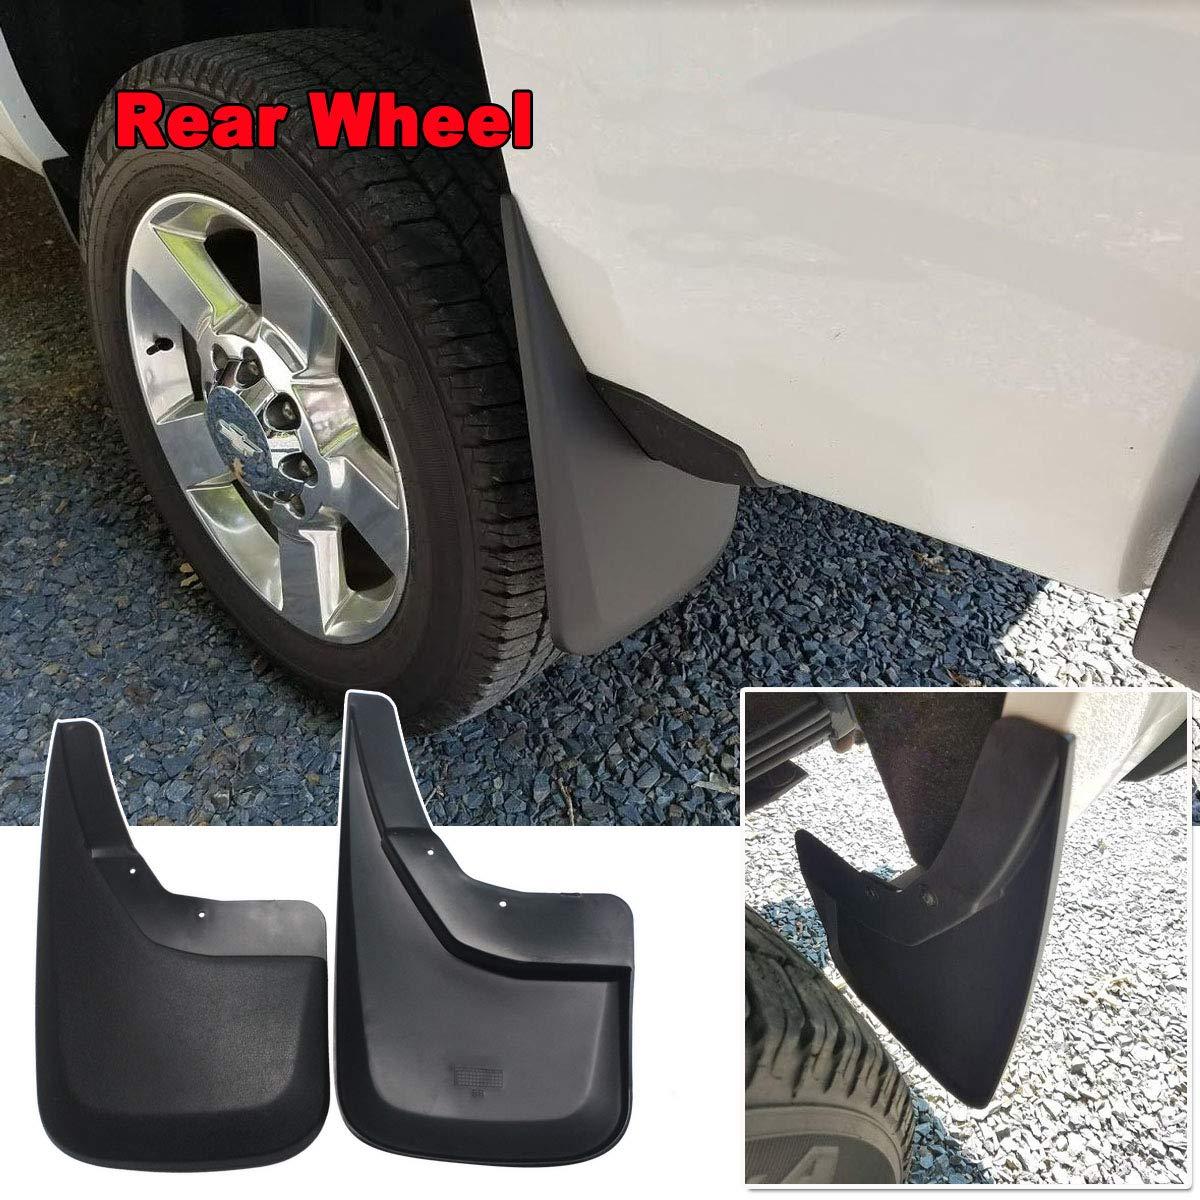 YOOSEN Mud Flaps for 14-18 Chevrolet Silverado 1500 and 15-19 Chevy Silverado 2500//3500 No Drill Splash Guards Kit 4-PC Set NOT Fit GMC Sierra